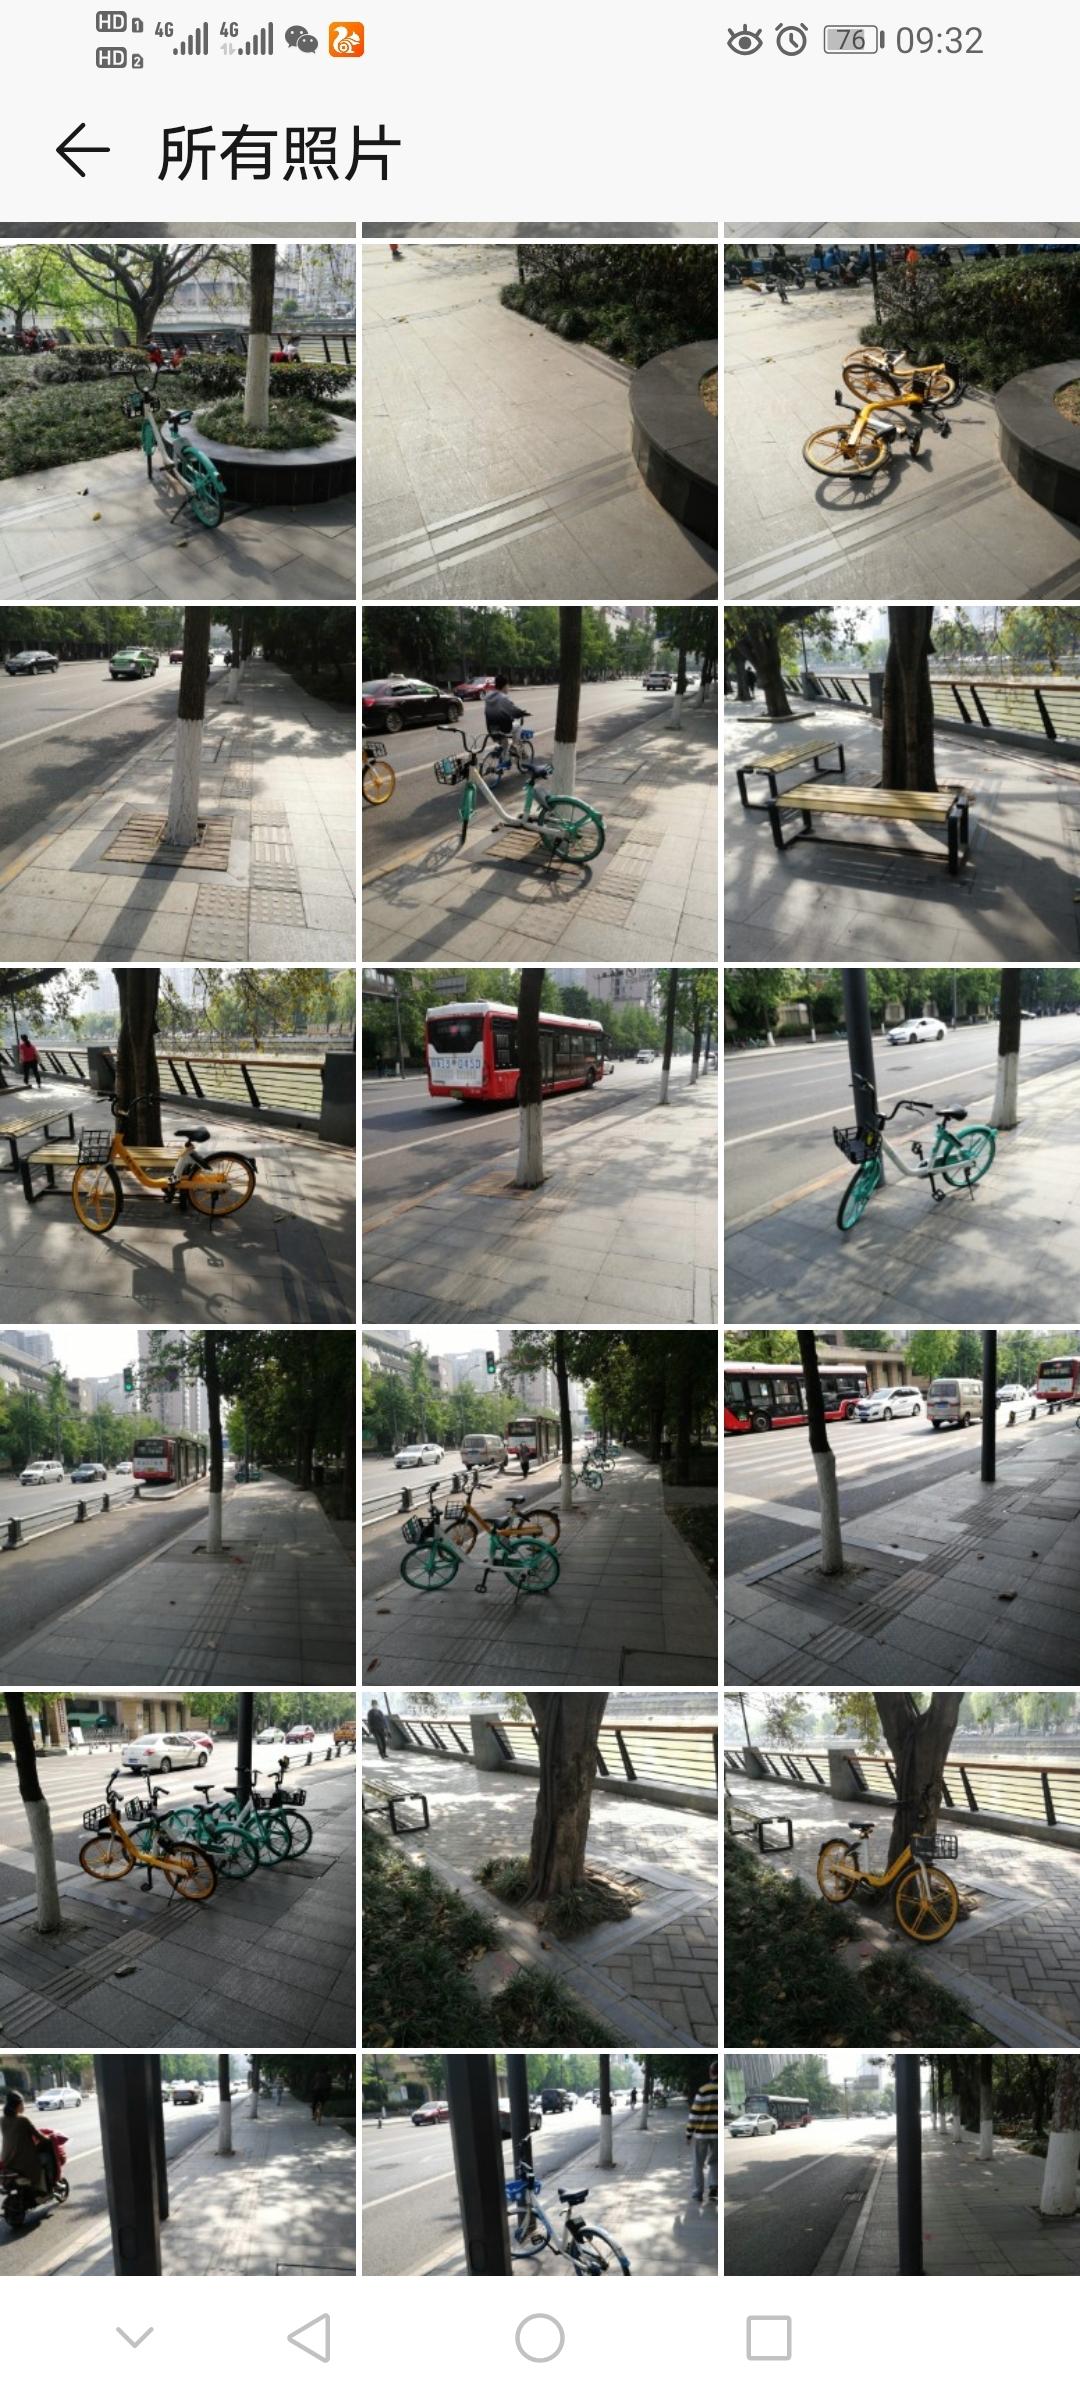 Screenshot_20200519_093252_com.android.gallery3d.jpg